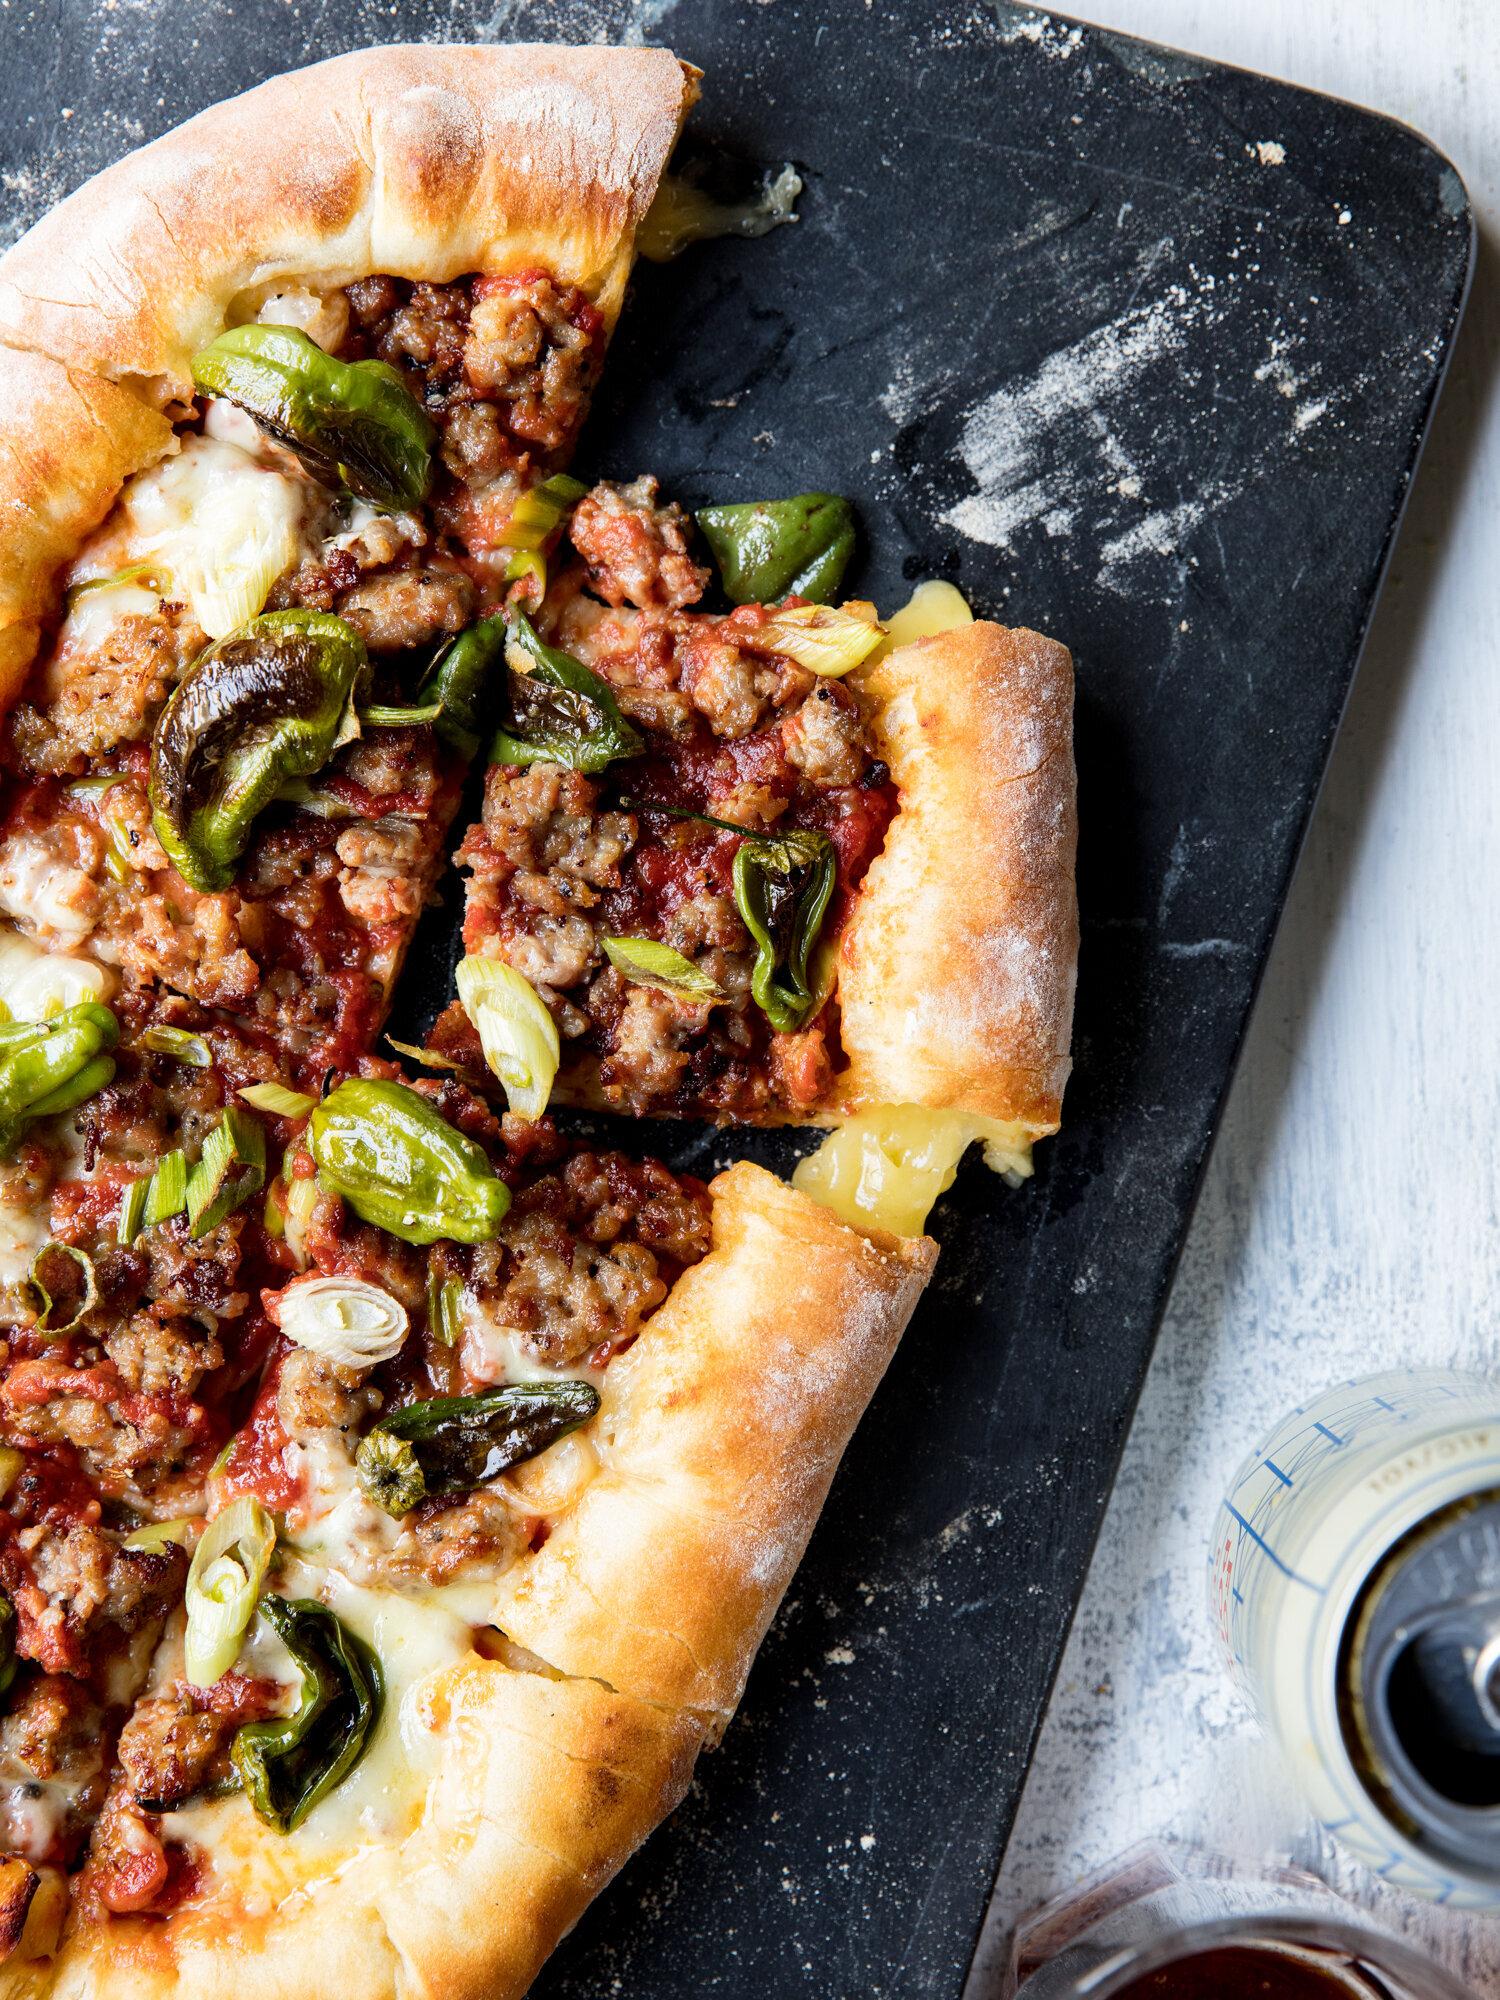 erin-scott-san-francisco-california-studio-food-photographer_Williams-Sonoma_TestKitchen_Pizza-cookbook-3.jpg